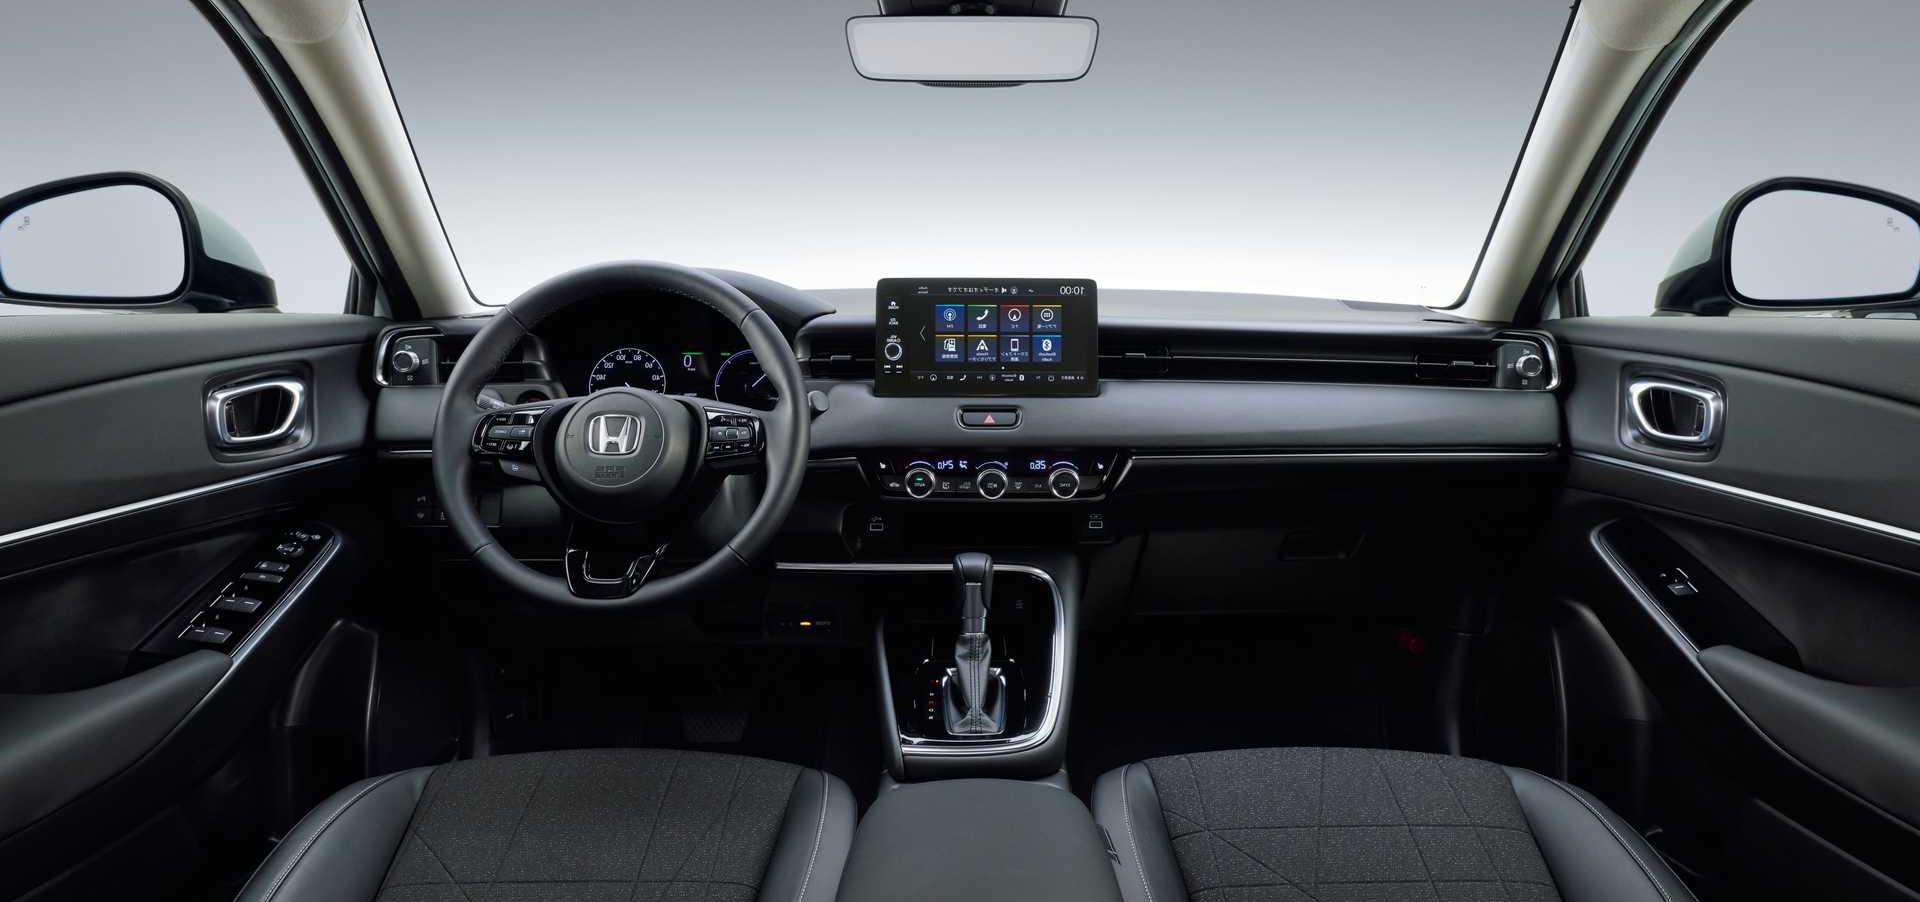 Novo Honda Hr V Painel